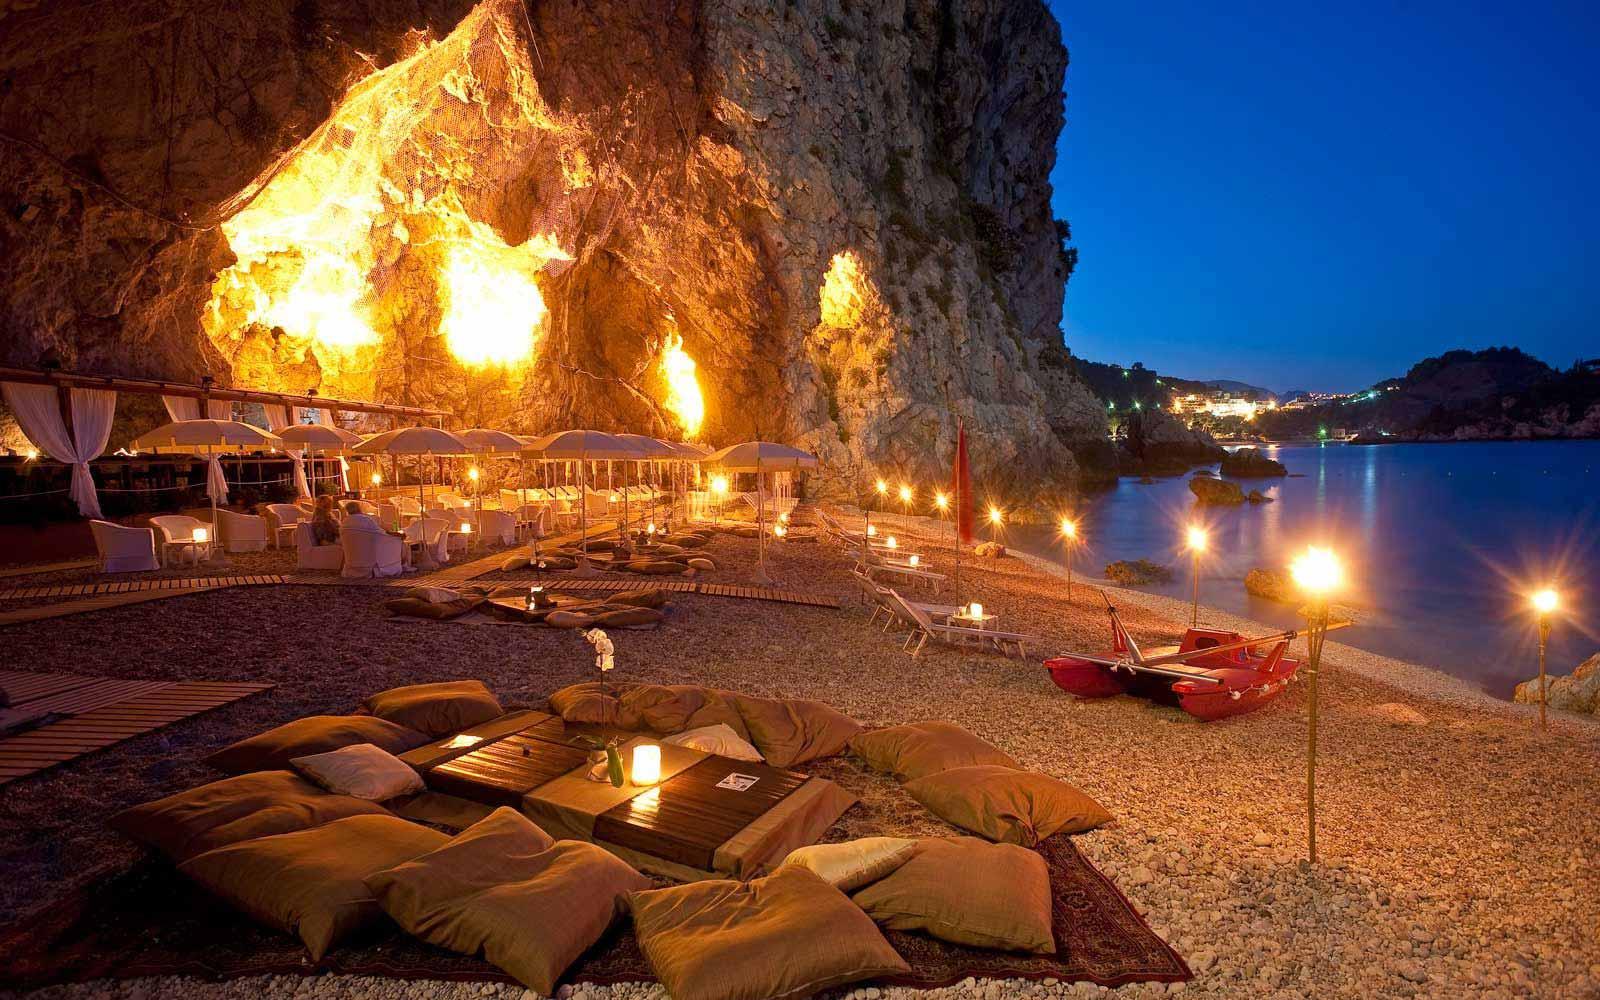 Beach cave at night at Atahotel Capotaormina